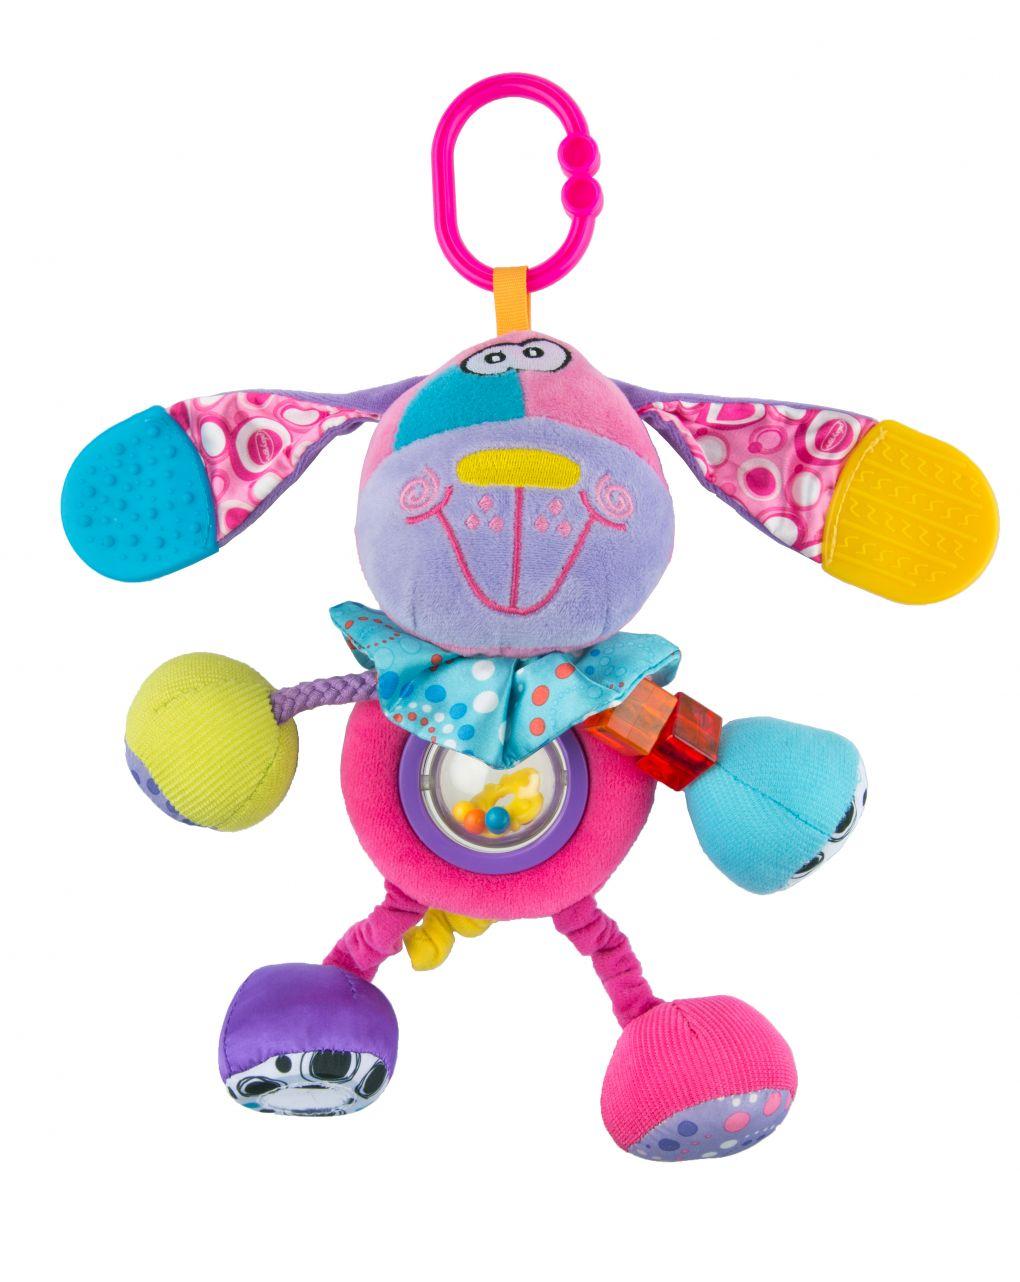 Playgro - activity doofy dog (pink) - Playgro